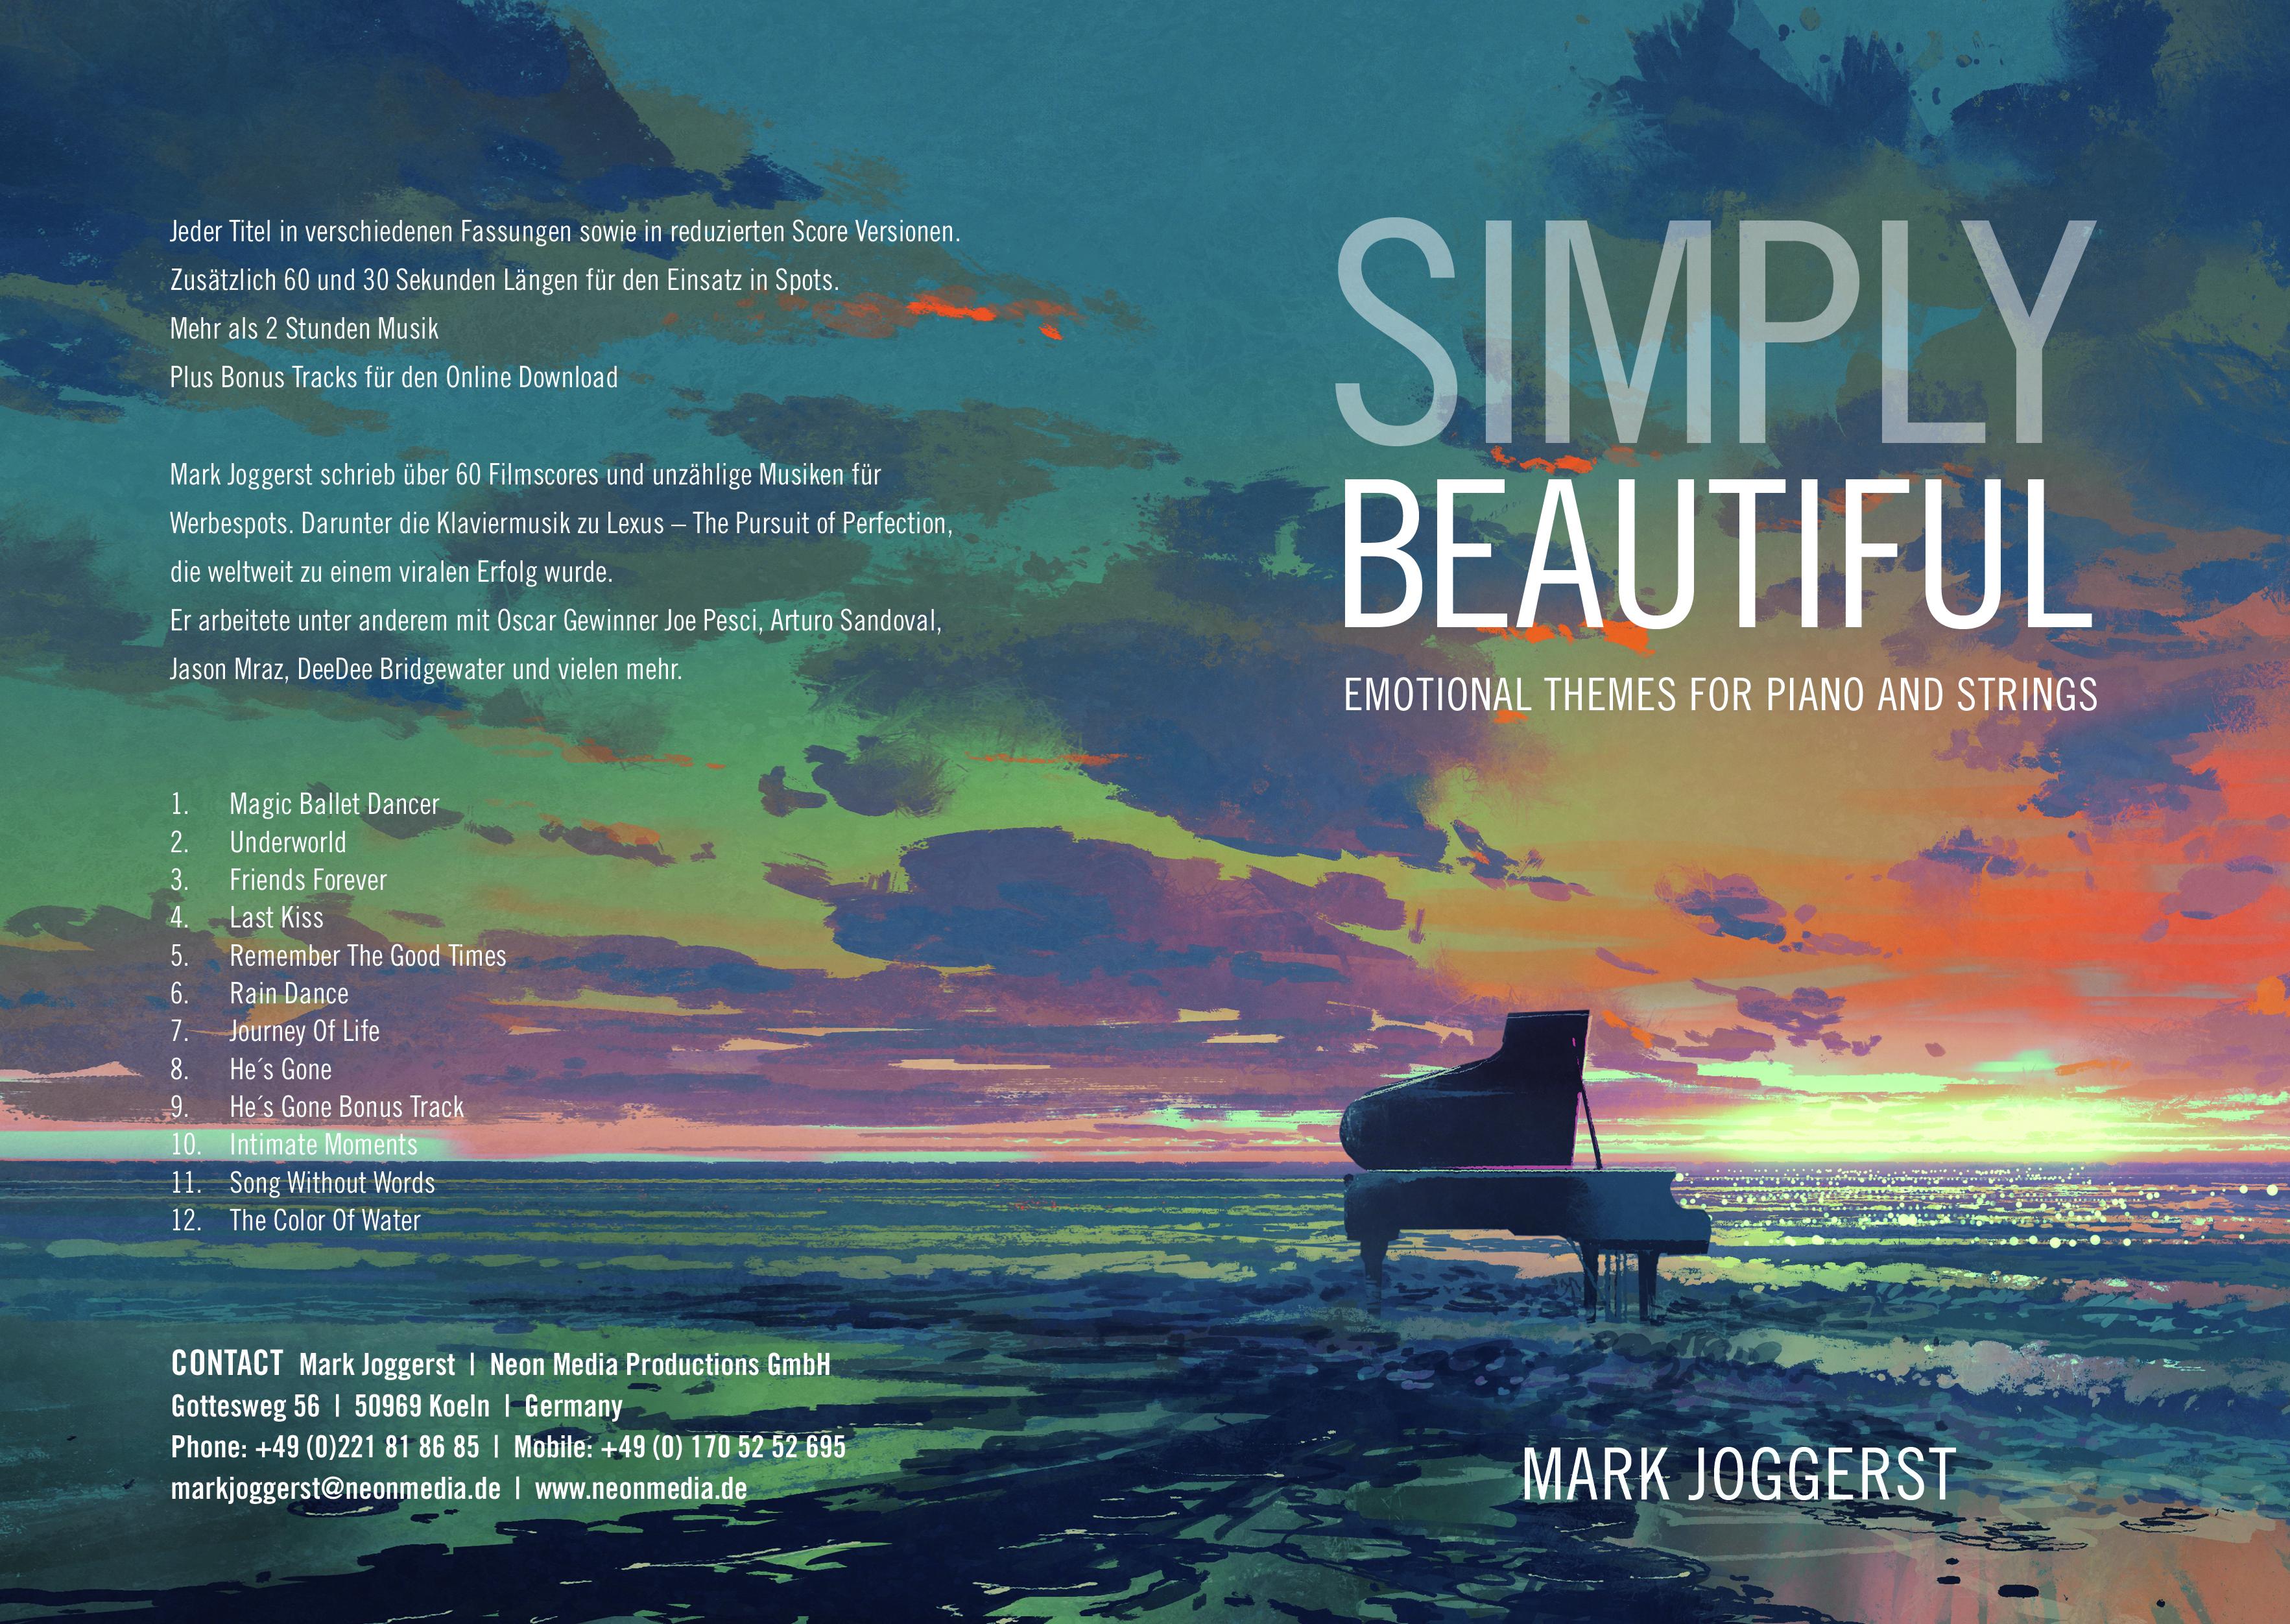 simply beautiful-vorder - Susanne Breuer   Grafik Design ...